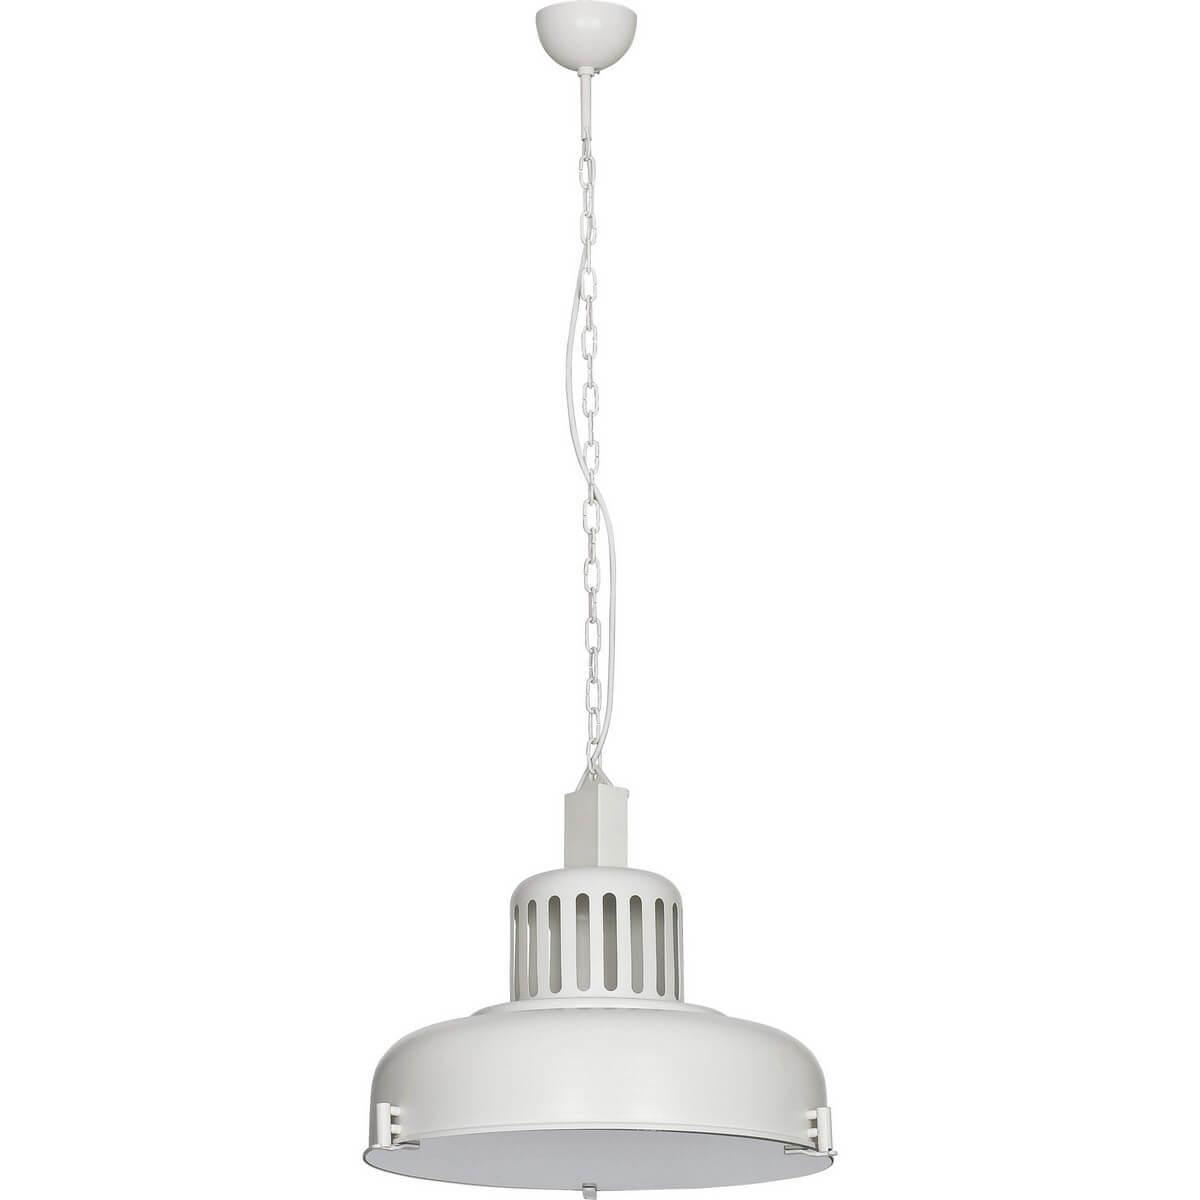 Светильник Nowodvorski 5532 Industrial White